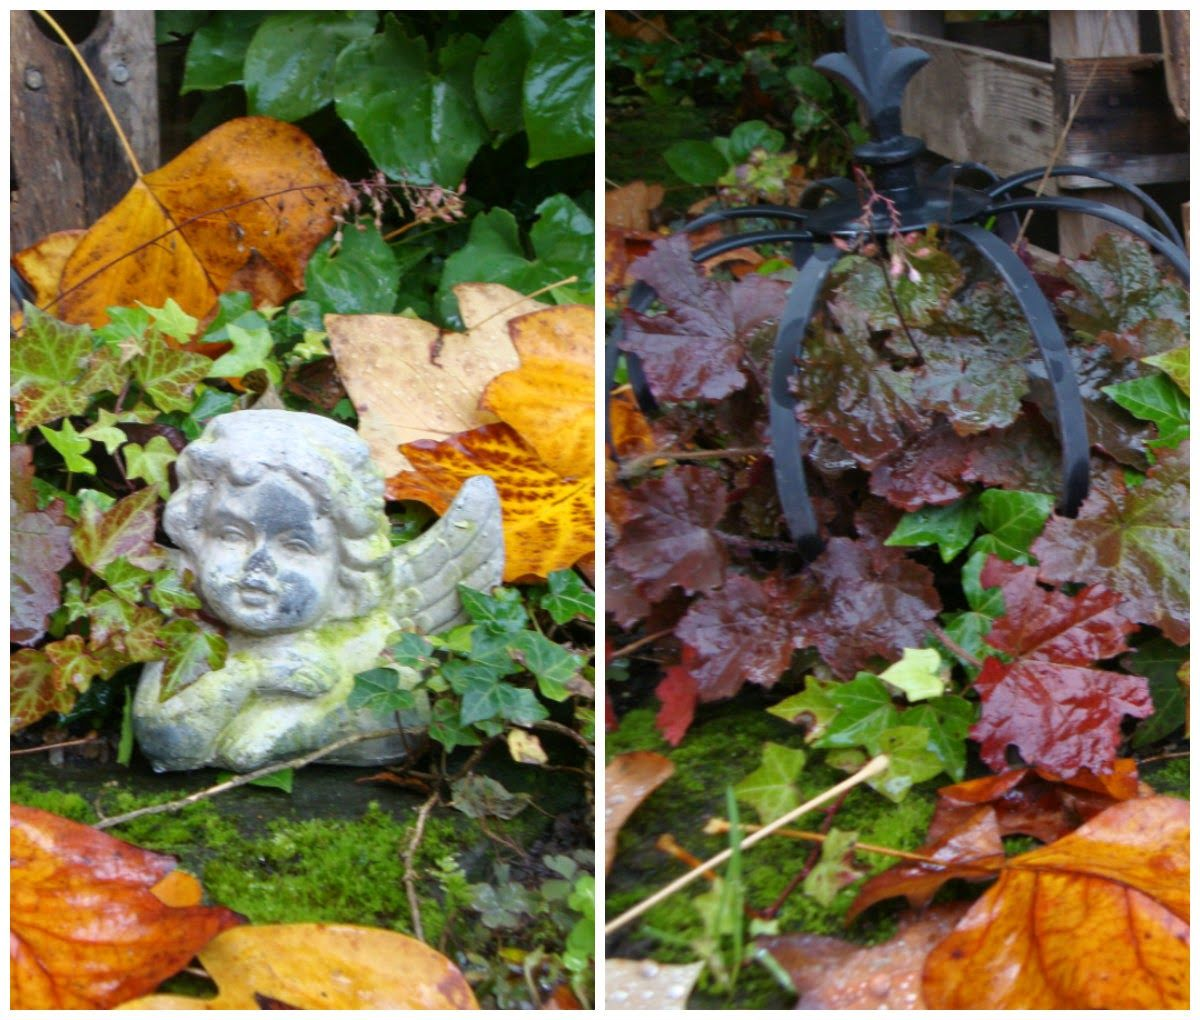 Herbstdeko garten herbstdekoration pinterest - Herbstdeko garten ...